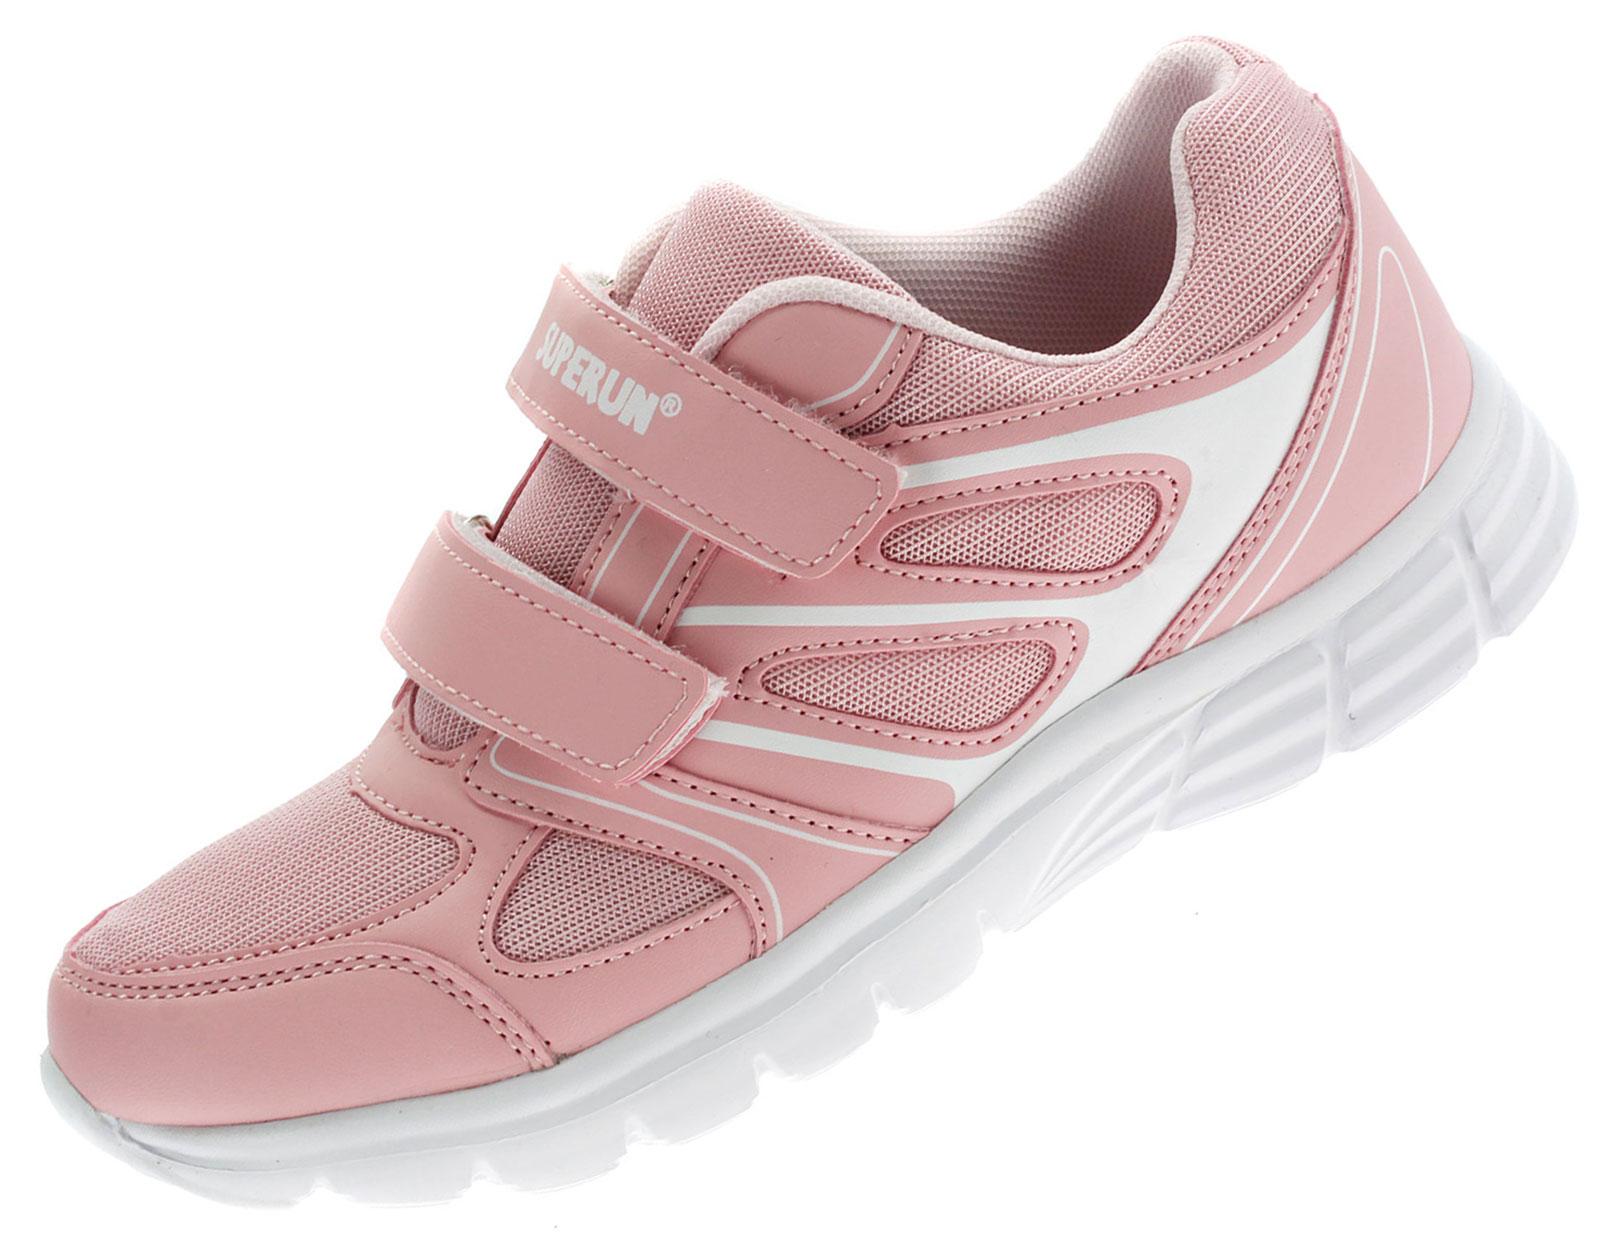 23. Pink